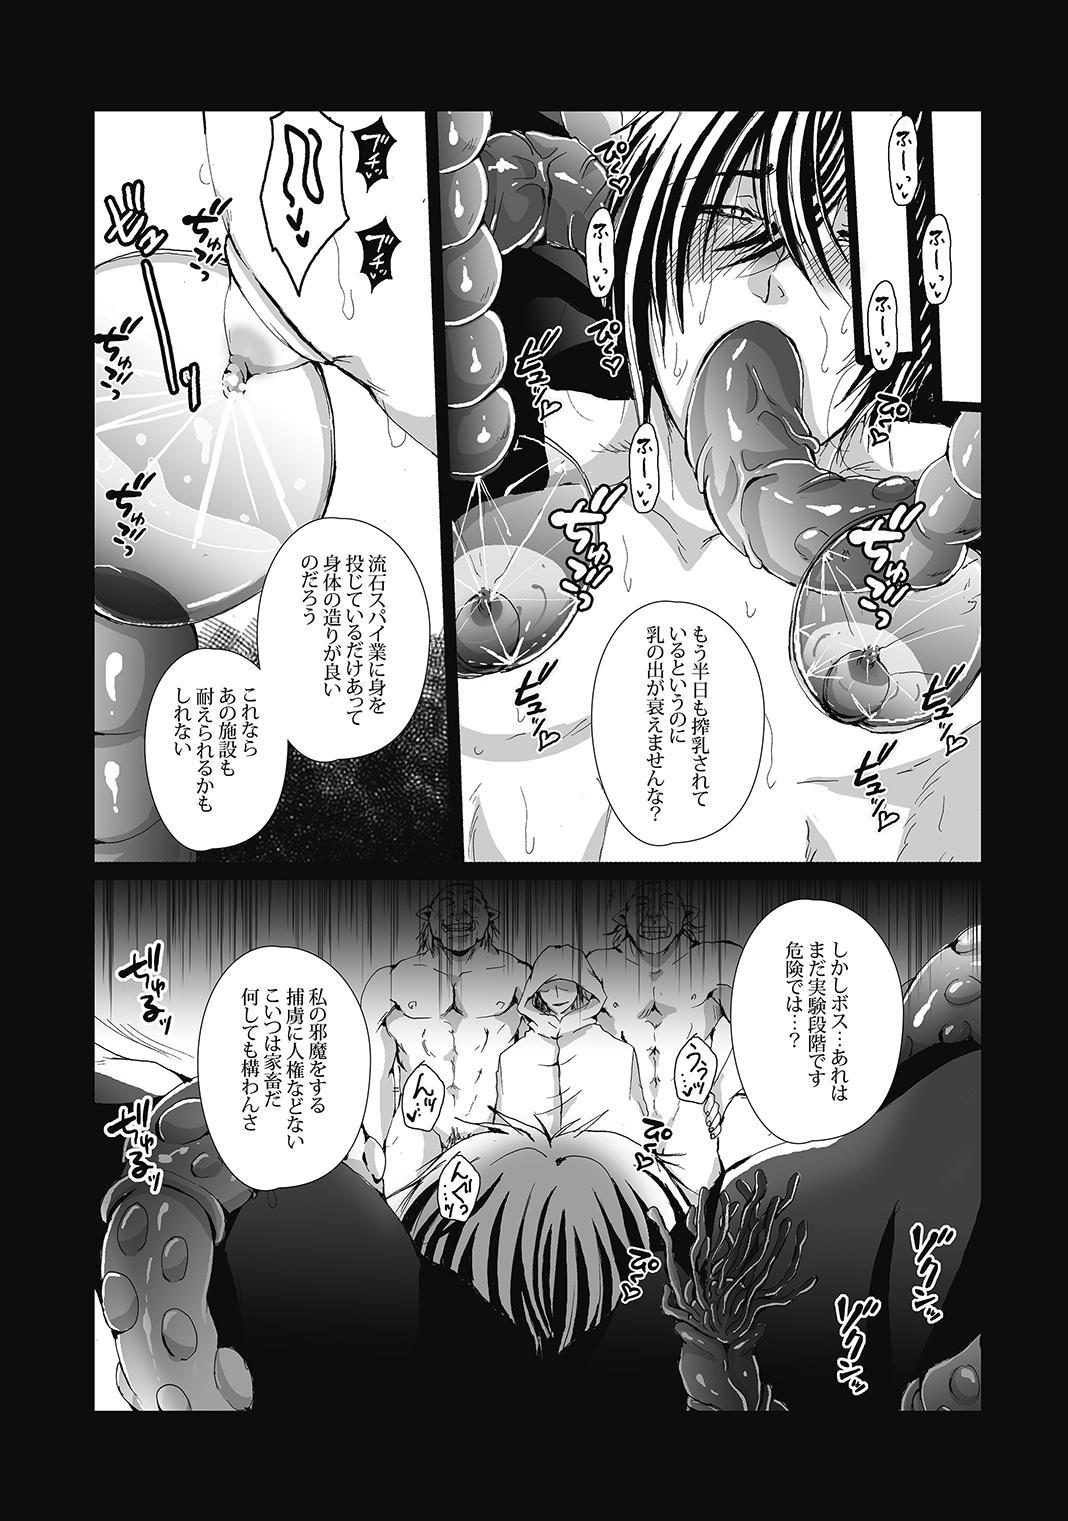 DLsite Girl's Maniax Anthology vol.4 8